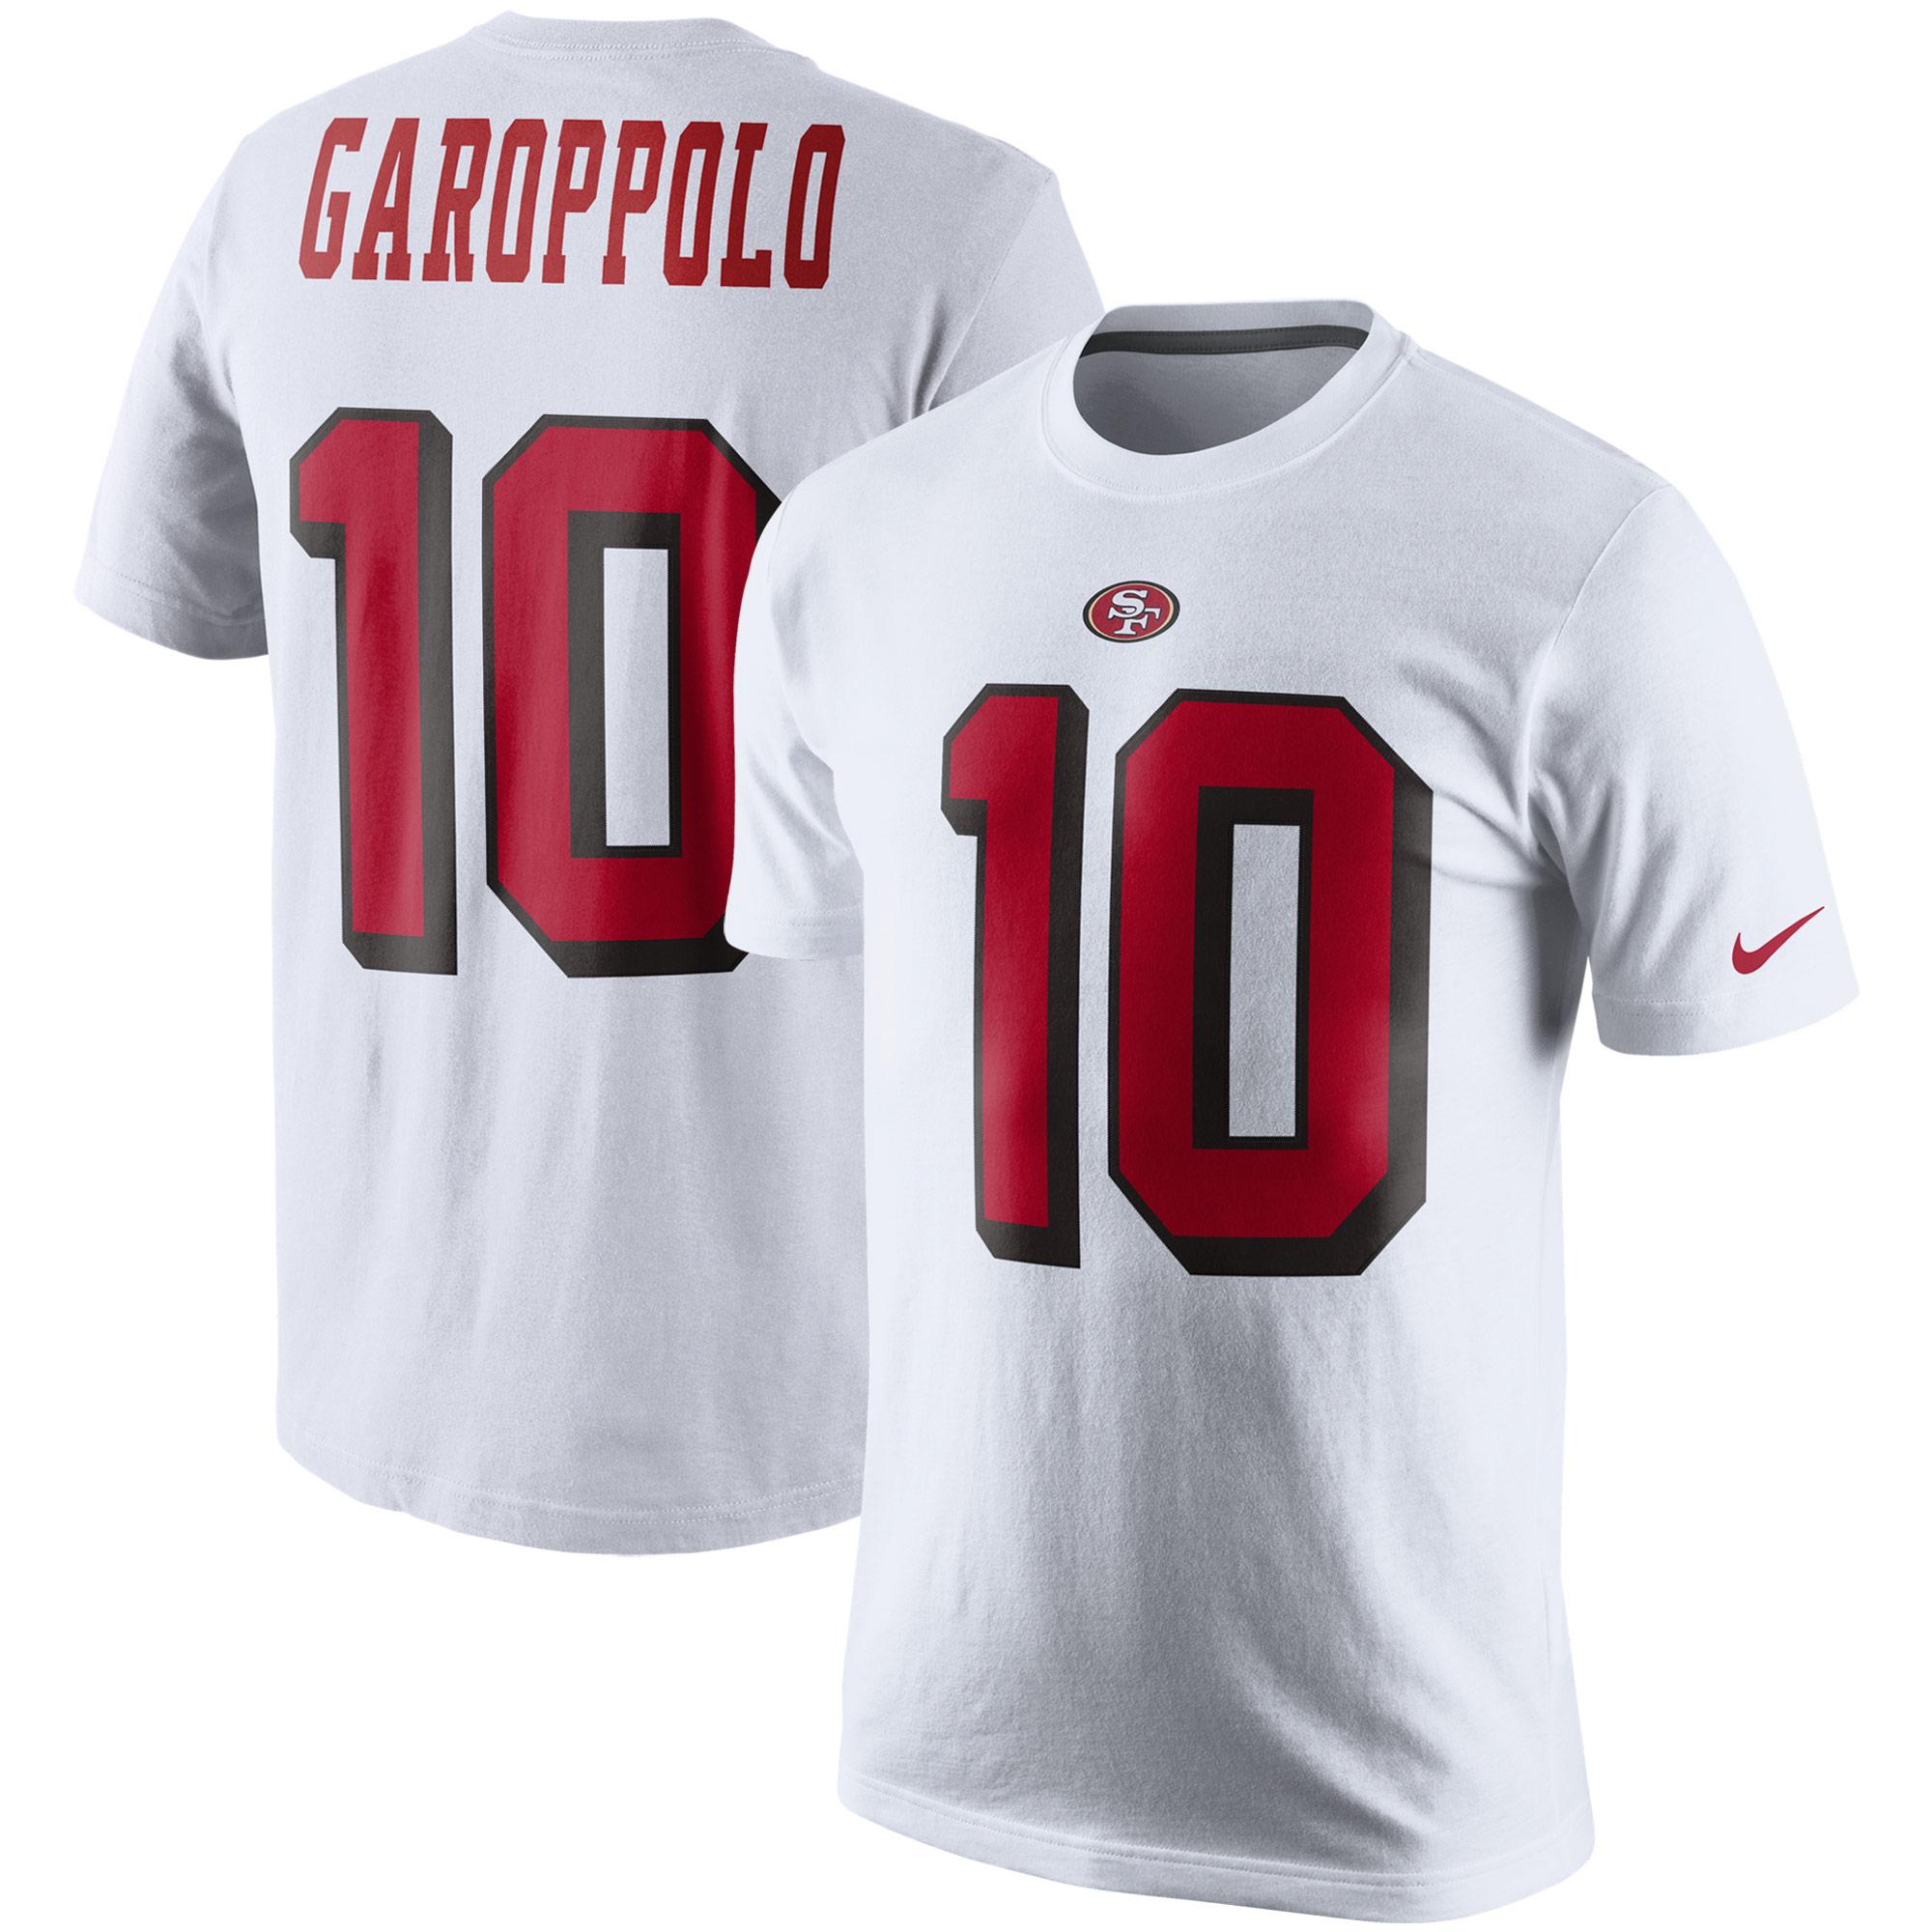 Jimmy Garoppolo San Francisco 49ers Nike Color Rush 2.0 Name & Number T-Shirt - White